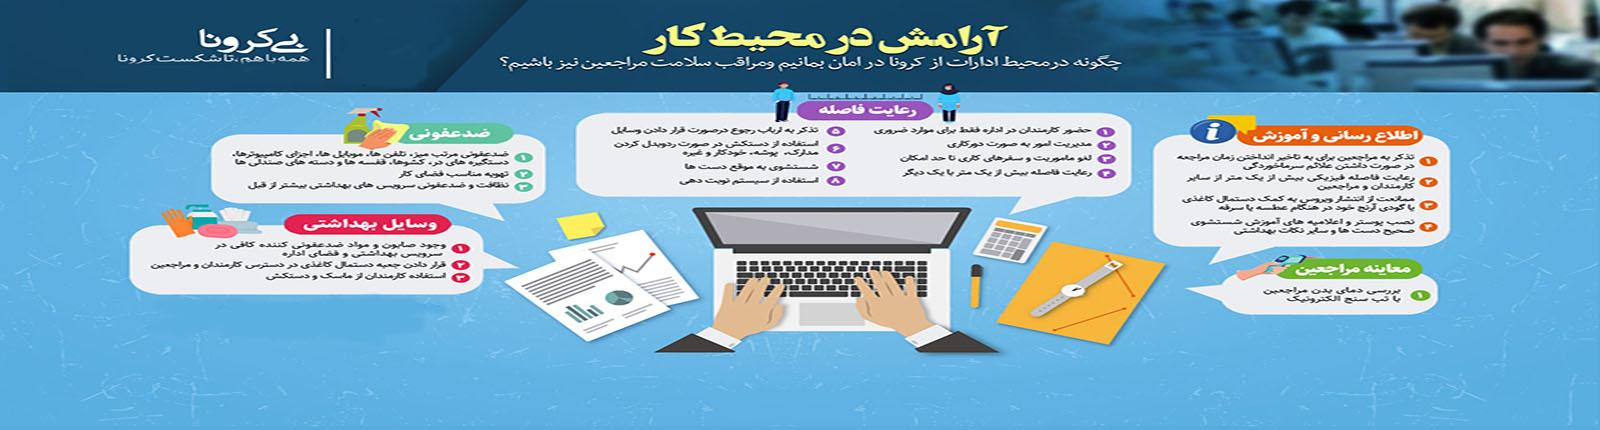 info_aramesh_dar_mohit_kar_edarat